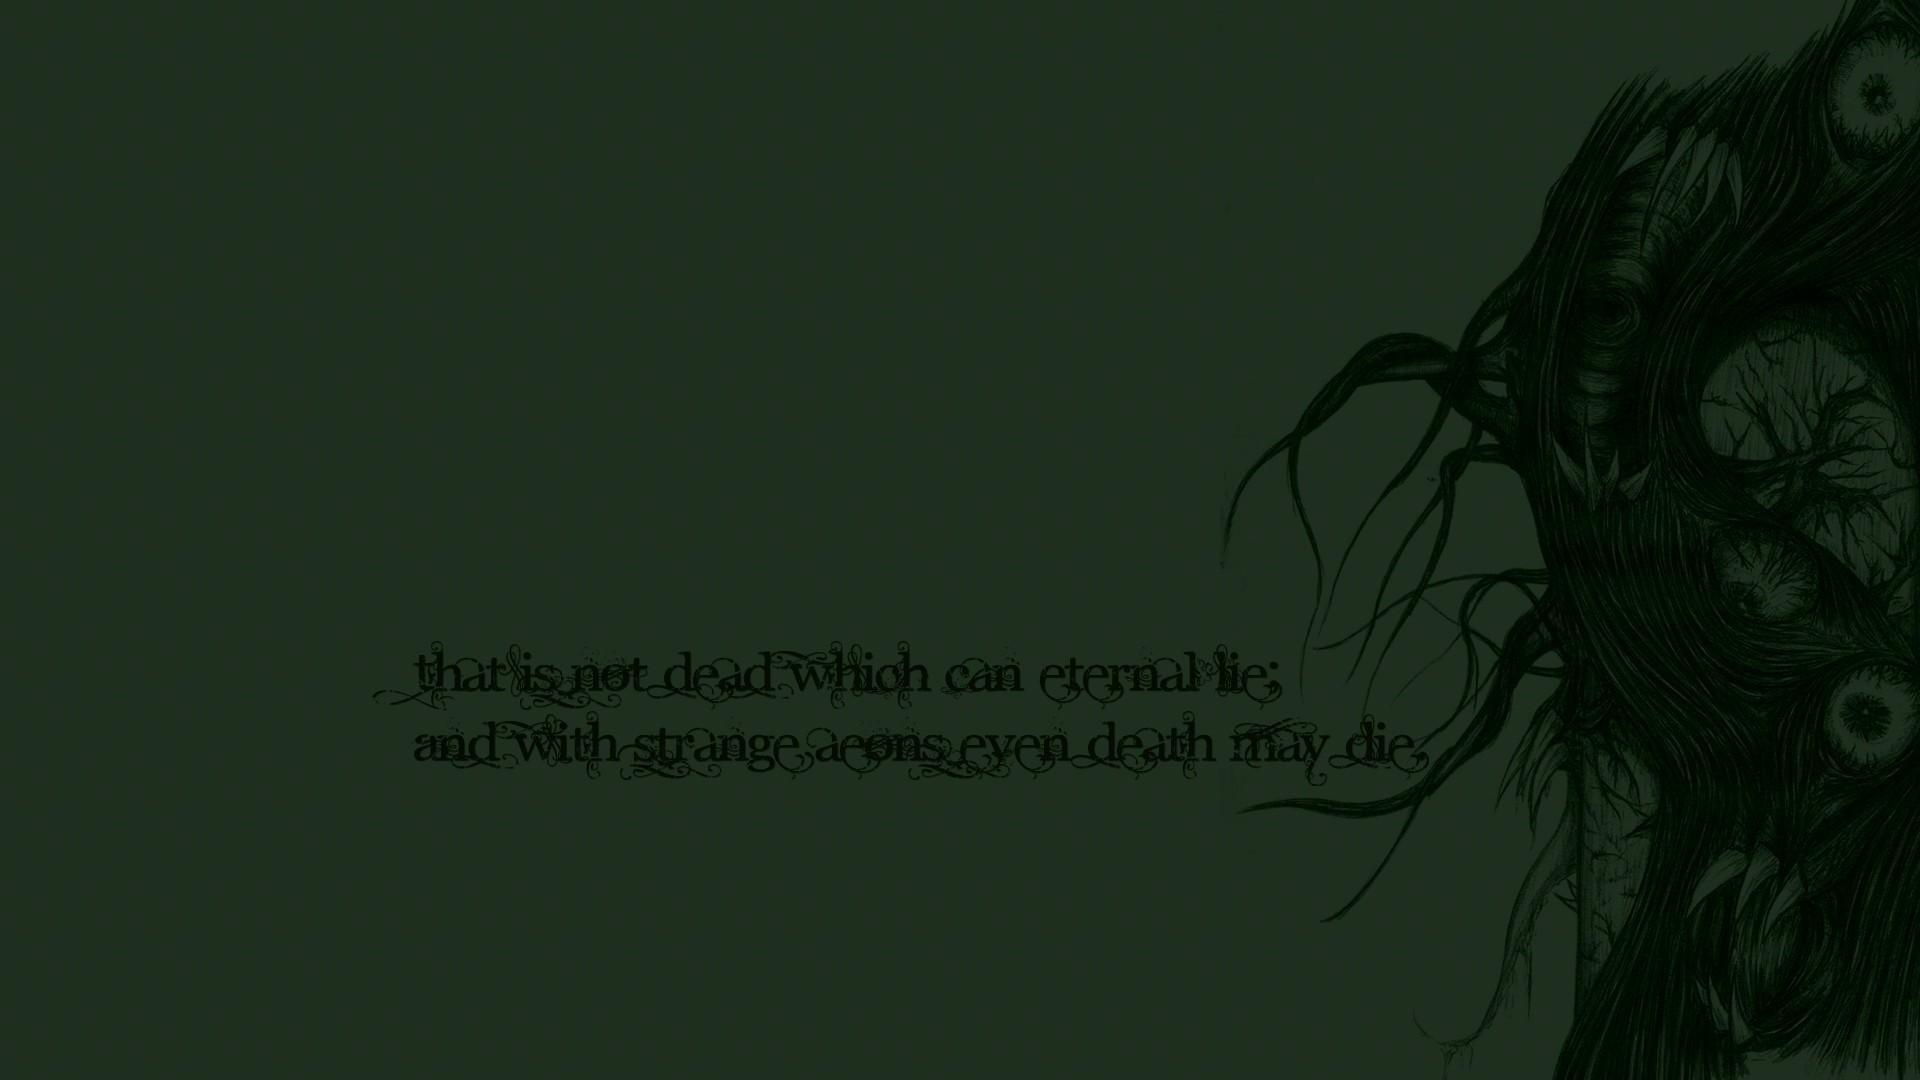 wallpaper.wiki-Cthulhu-Backgrounds-HD-PIC-WPE009866